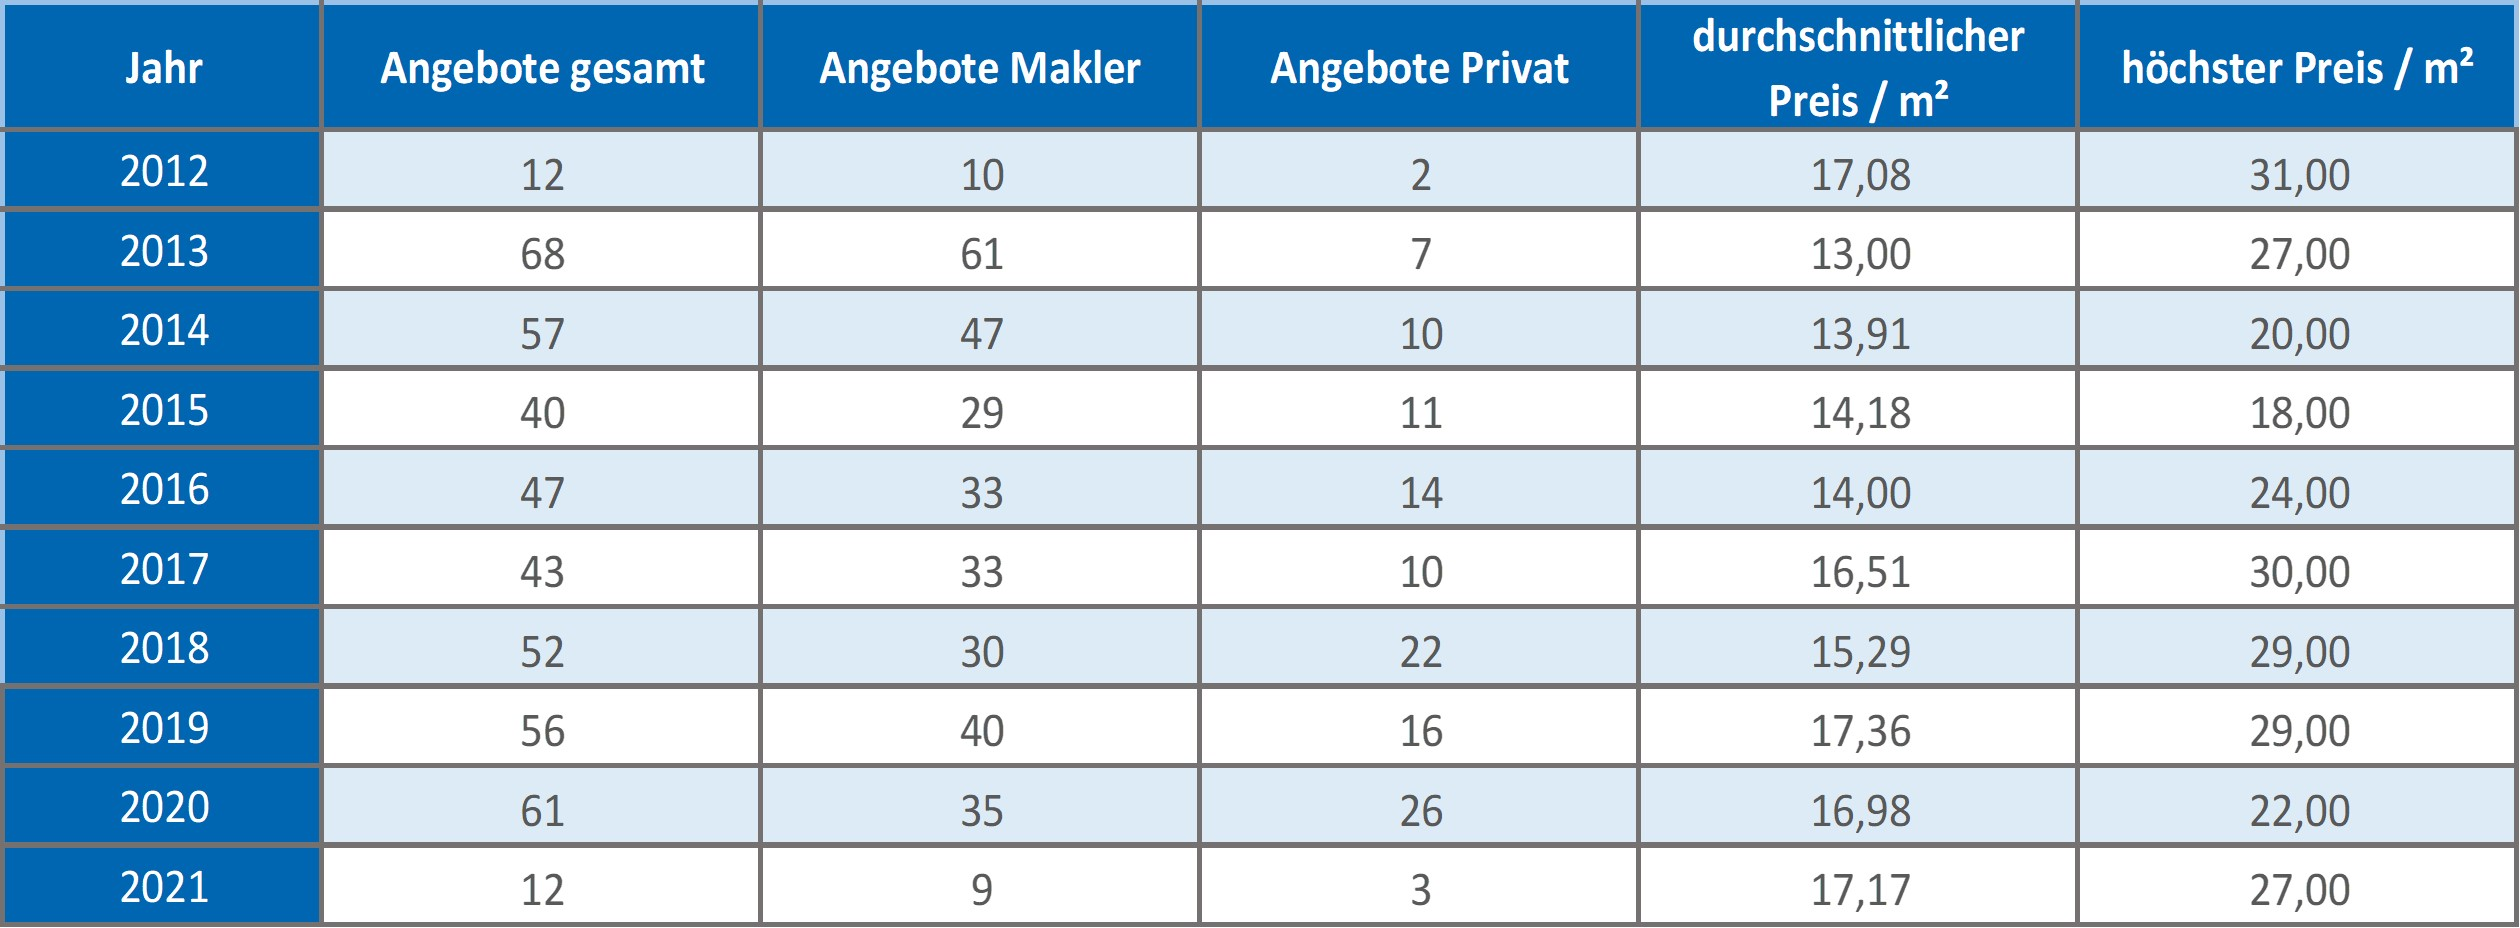 Berg am Starnberger See makler wohnung mieten 2019, 2020, 2021 vermieten preis bewertung www.happy-immo.de